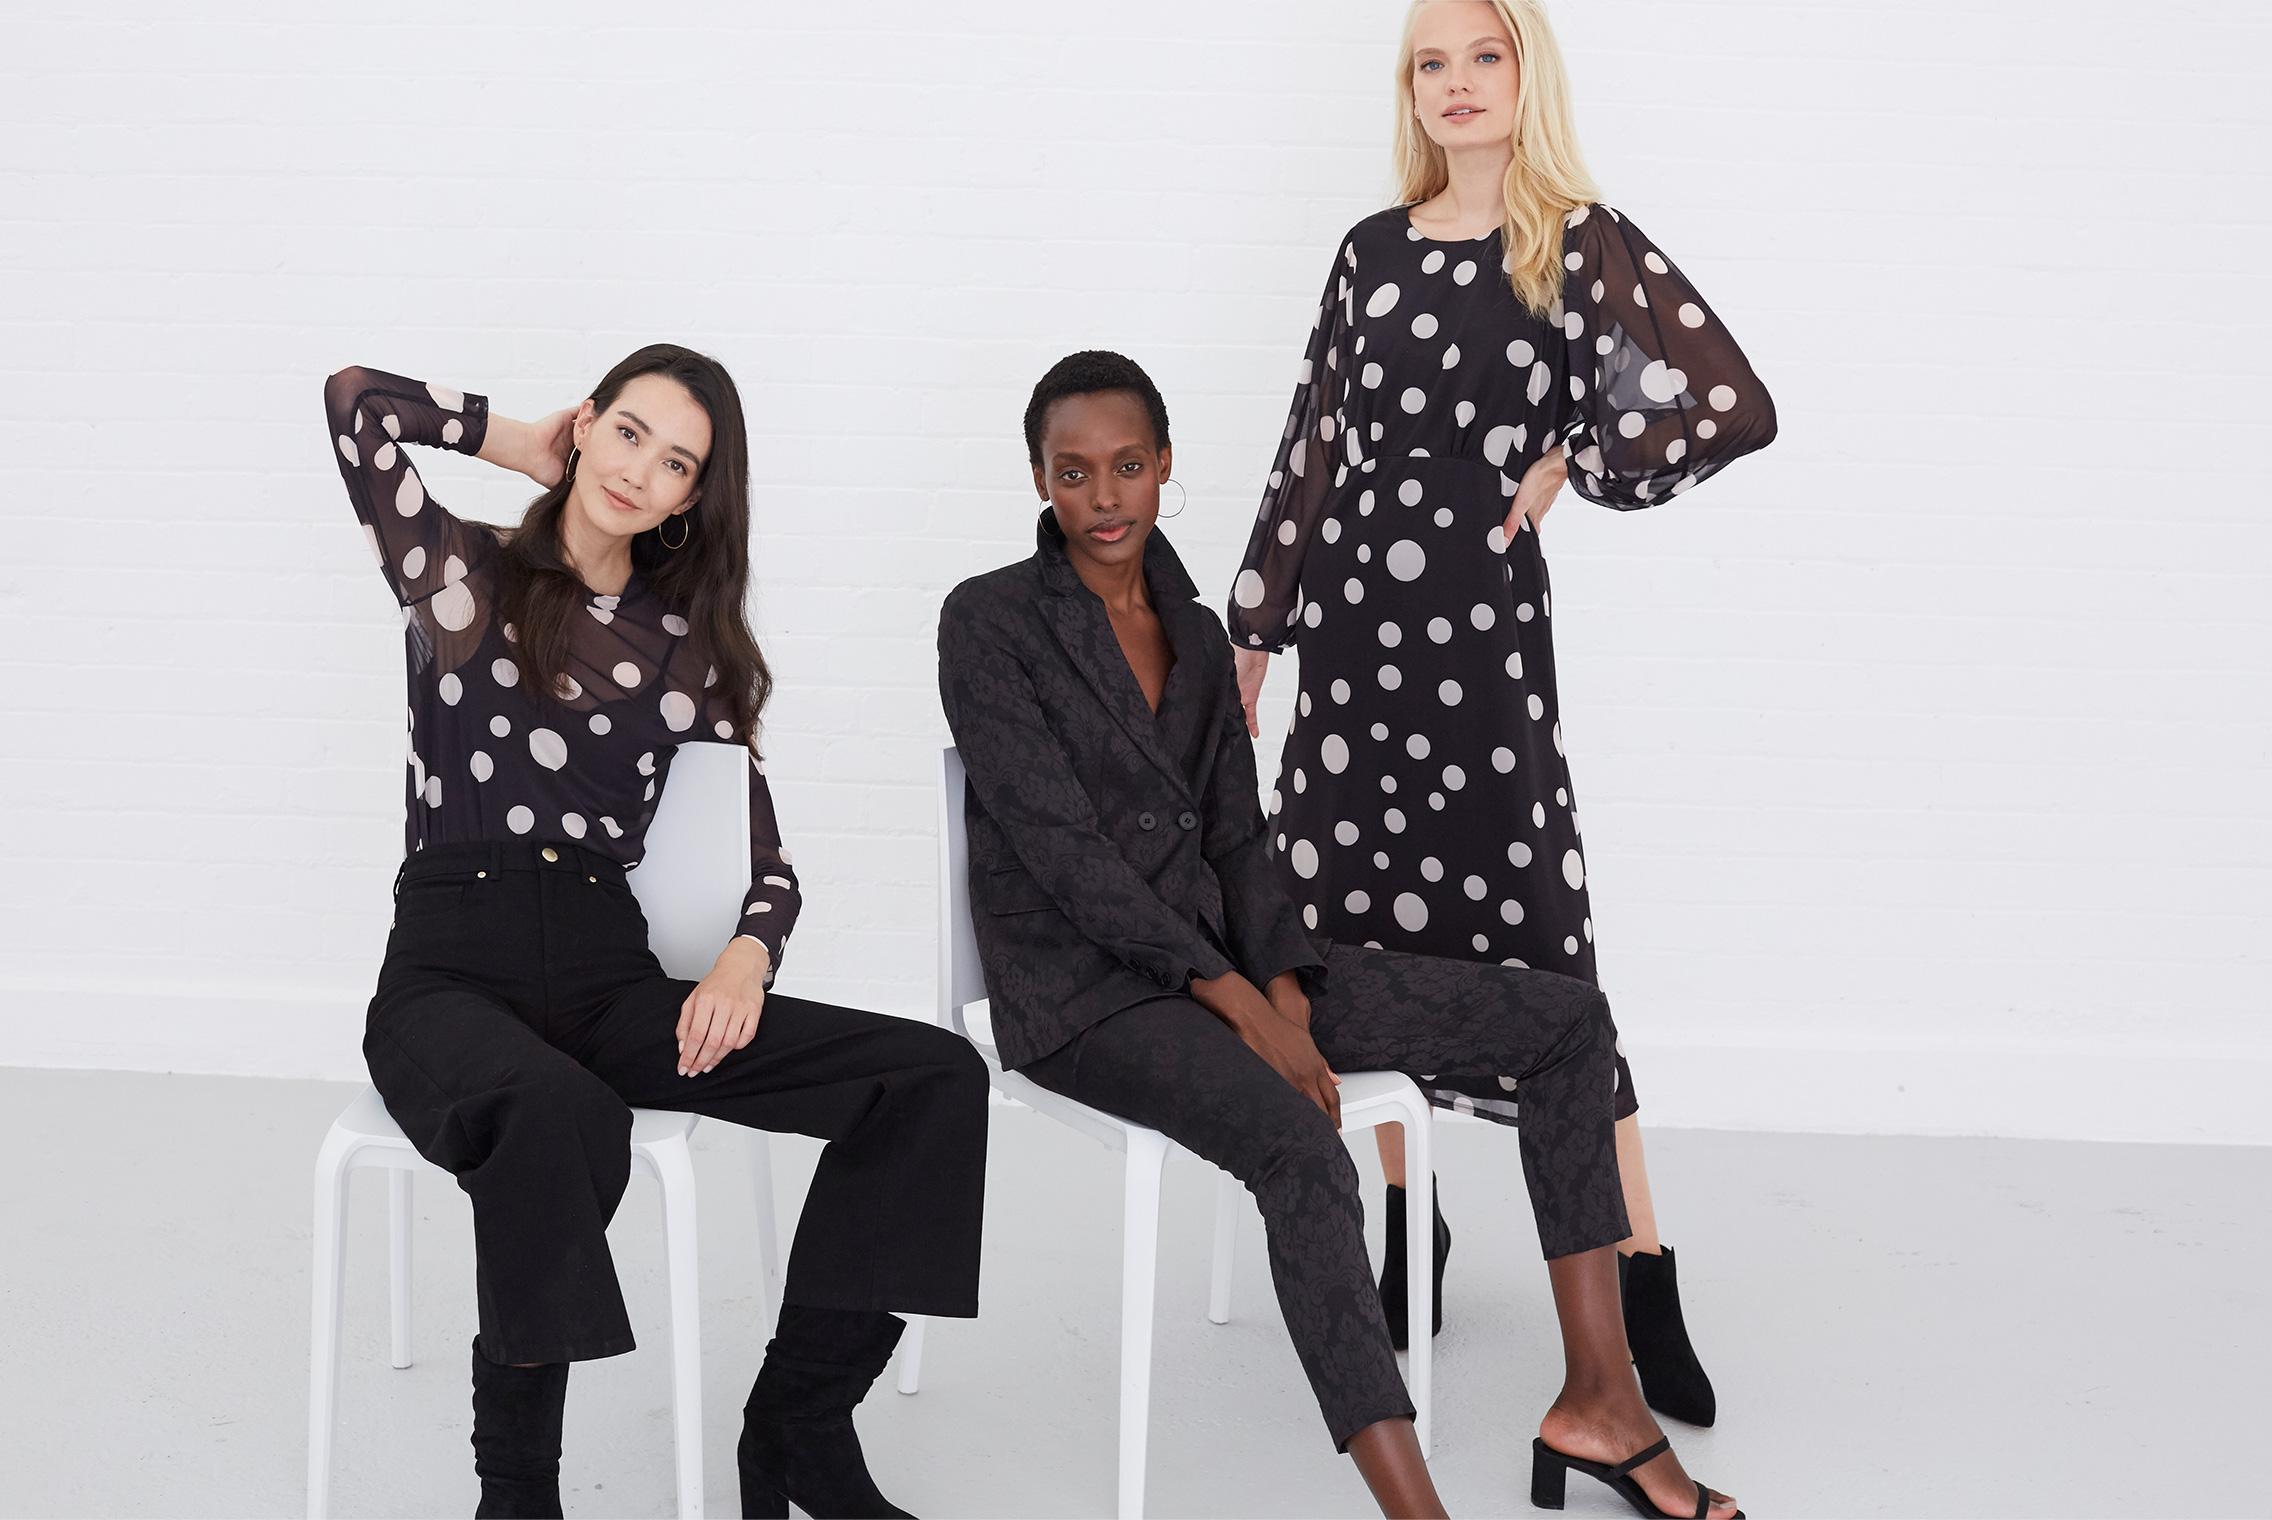 Vita Spot Mesh print Top £55 | Joanna Jacquard Suit Jacket £110 | Vita Mesh Print Dress £99